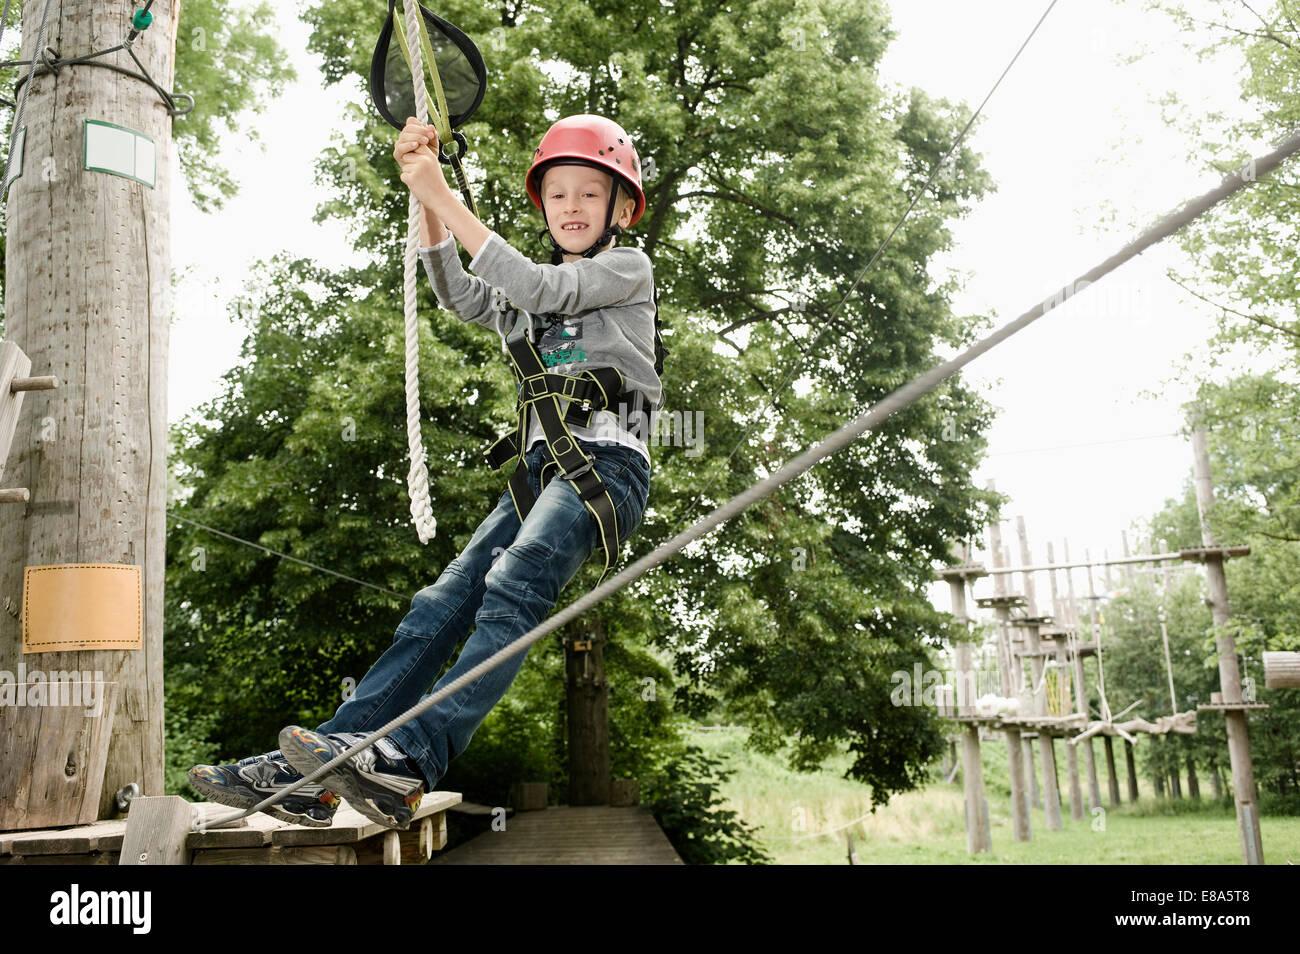 Boy climbing crag, smiling - Stock Image